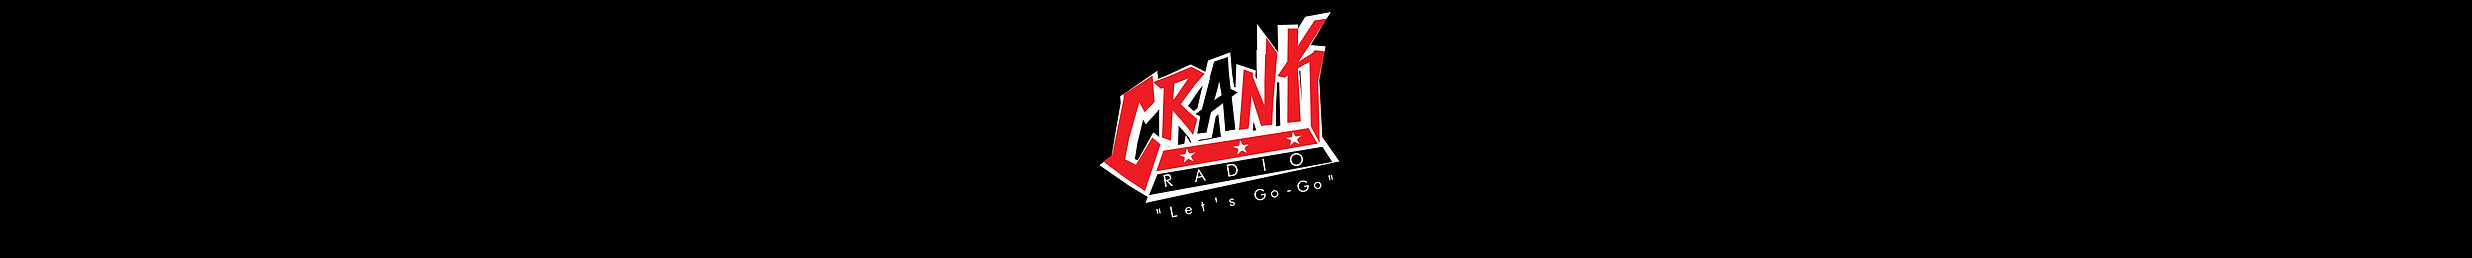 CRANK_RADIO copy.jpg